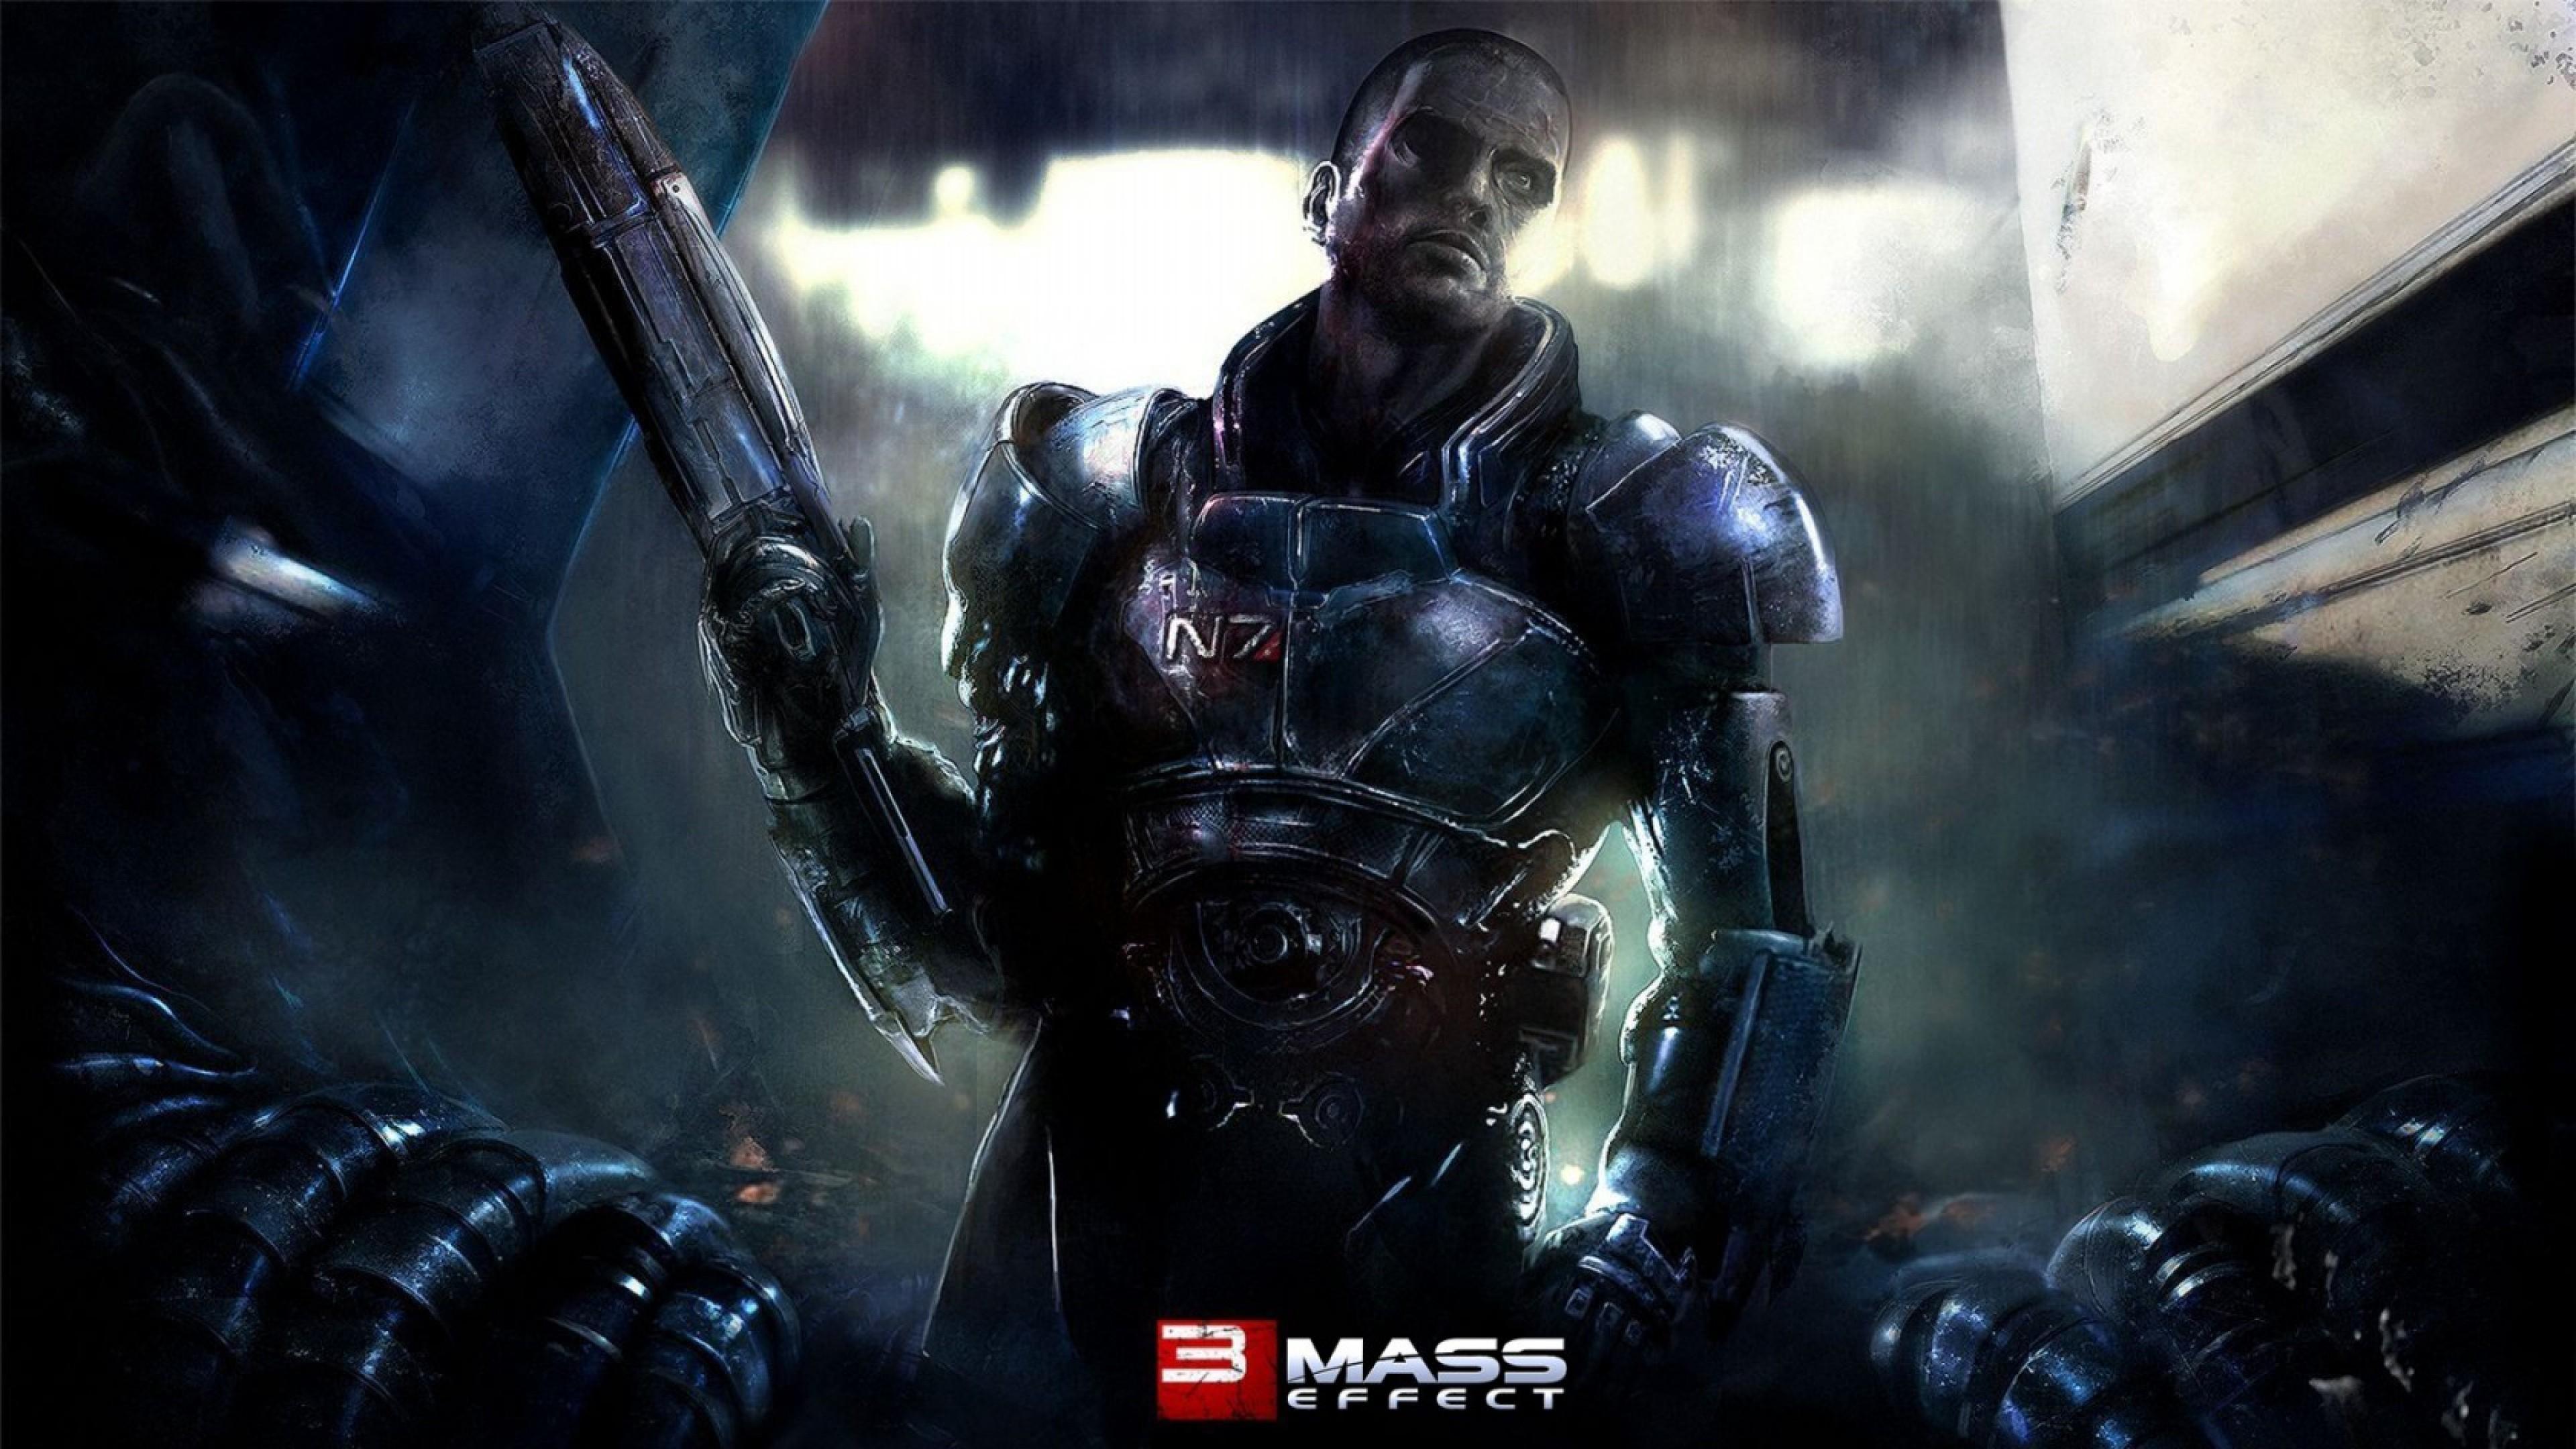 Res: 3840x2160, 10/03/2018 Mass Effect 3 N7 Wallpaper | Resolution:  px,